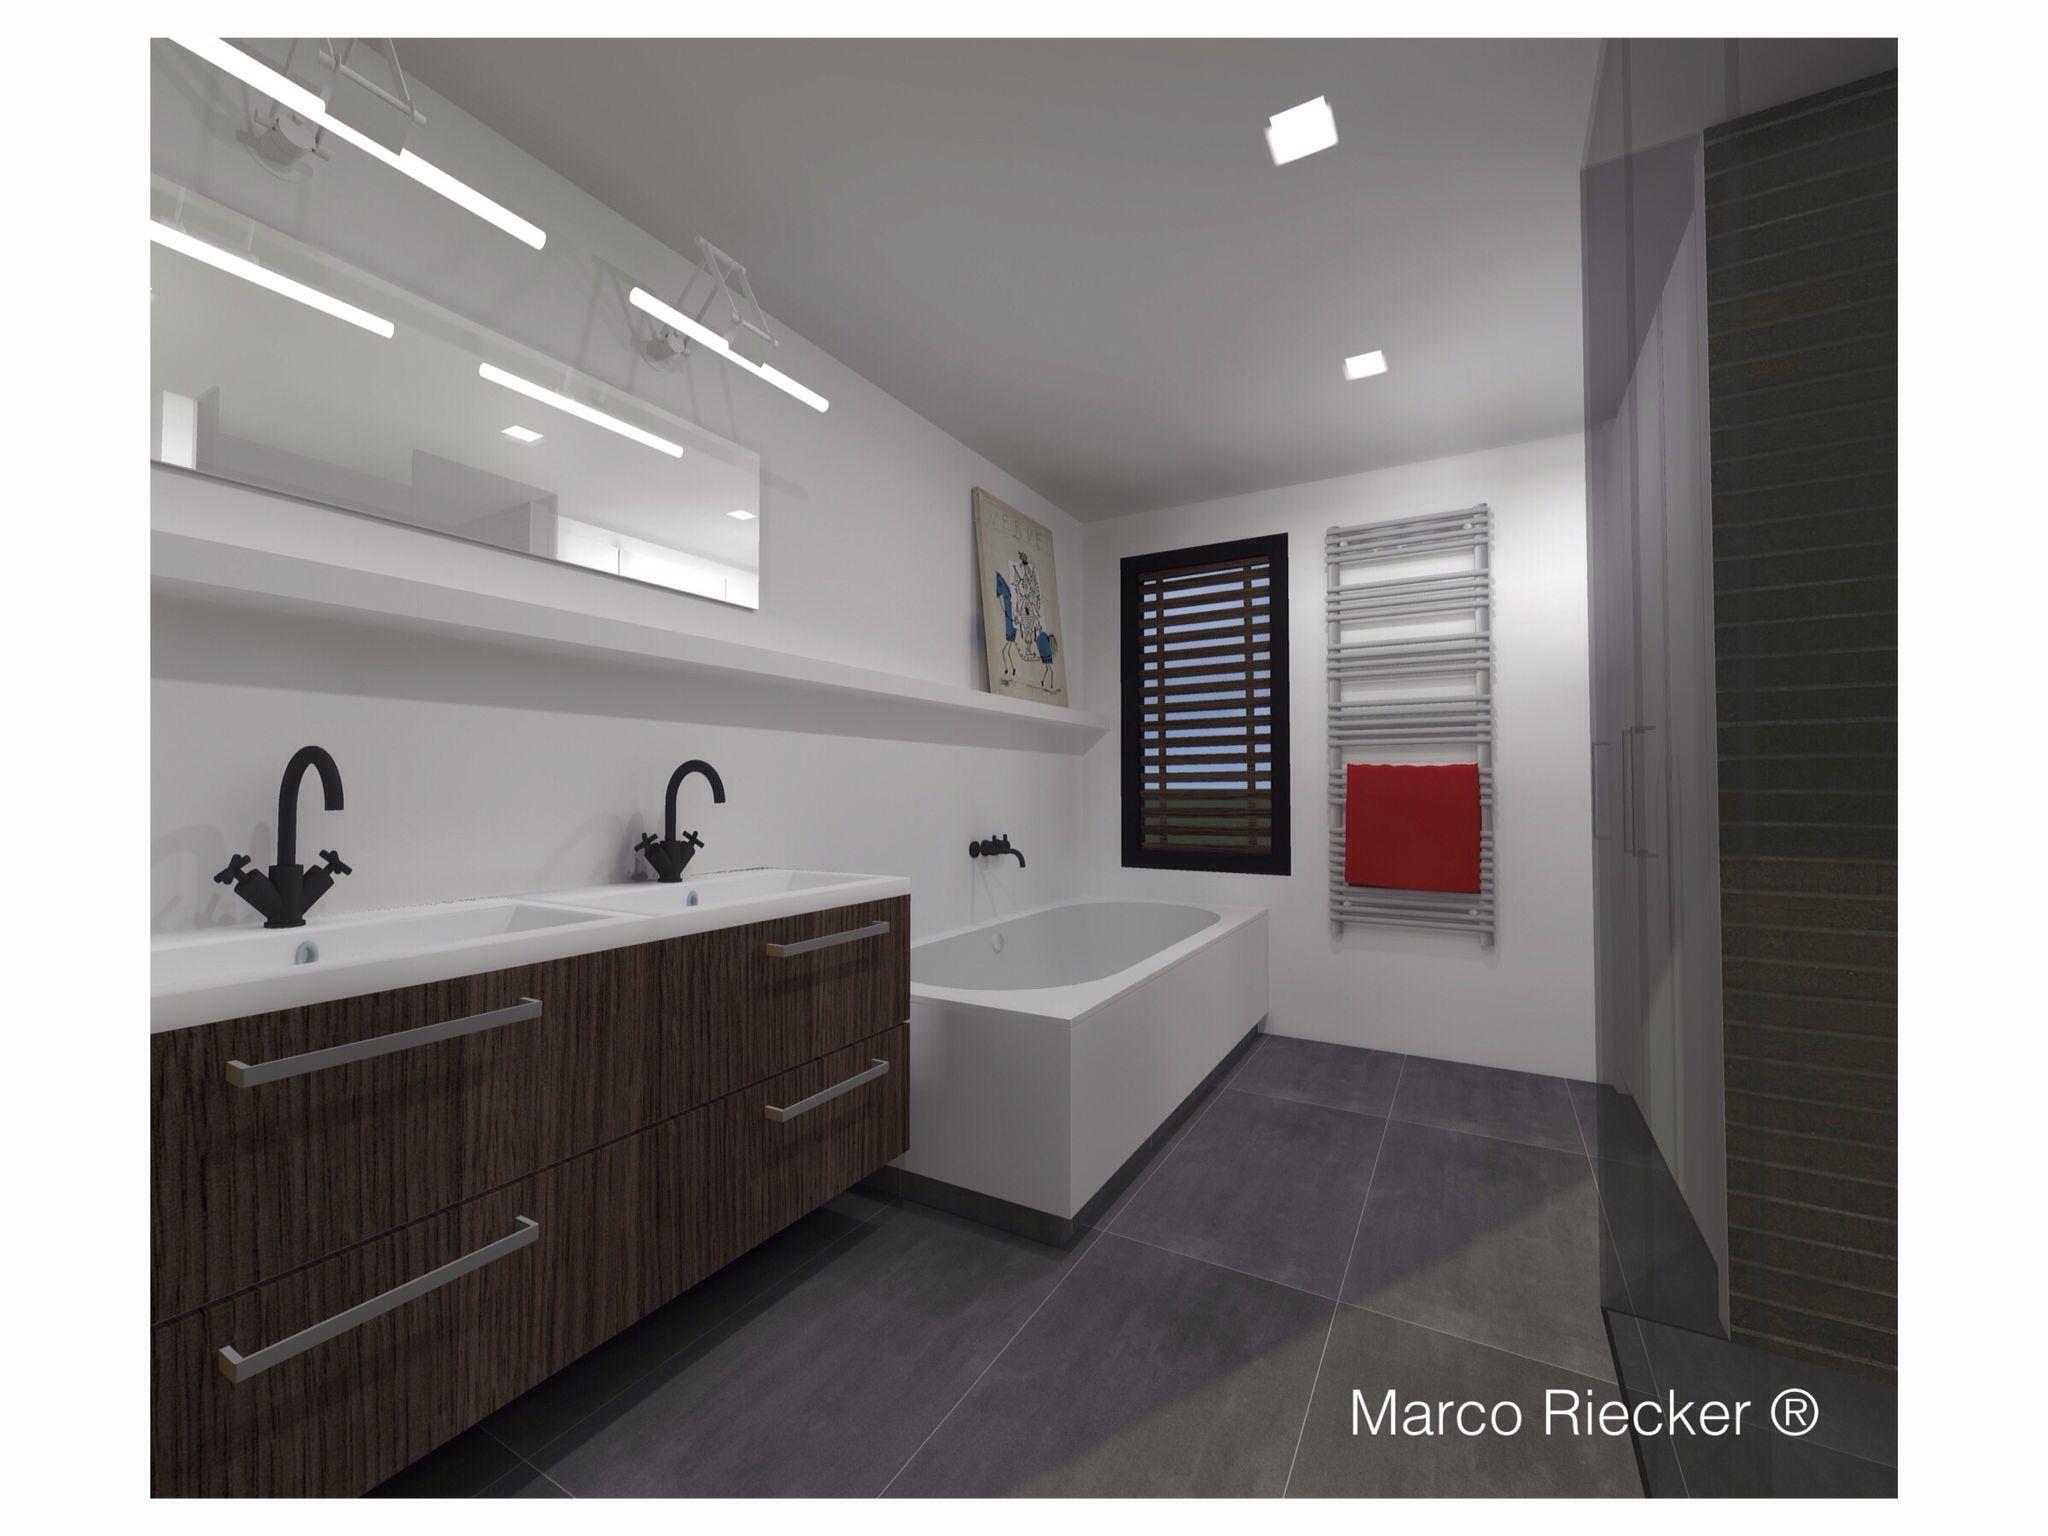 Badkamer Beemster SketchUp Marco Riecker ® made this | Marco Riecker ...